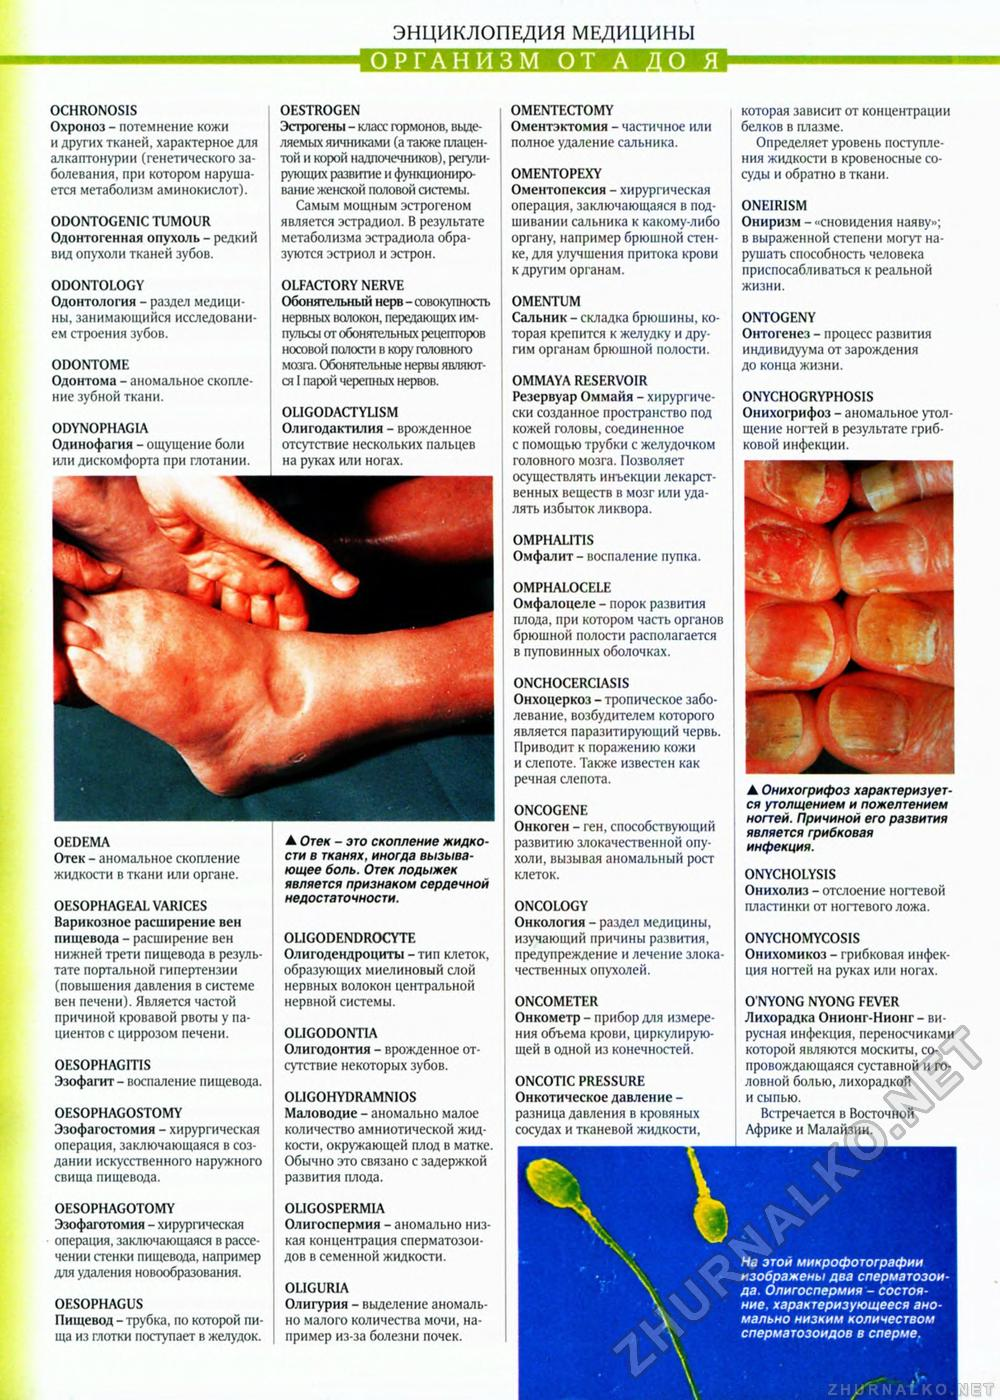 Оментэктомия